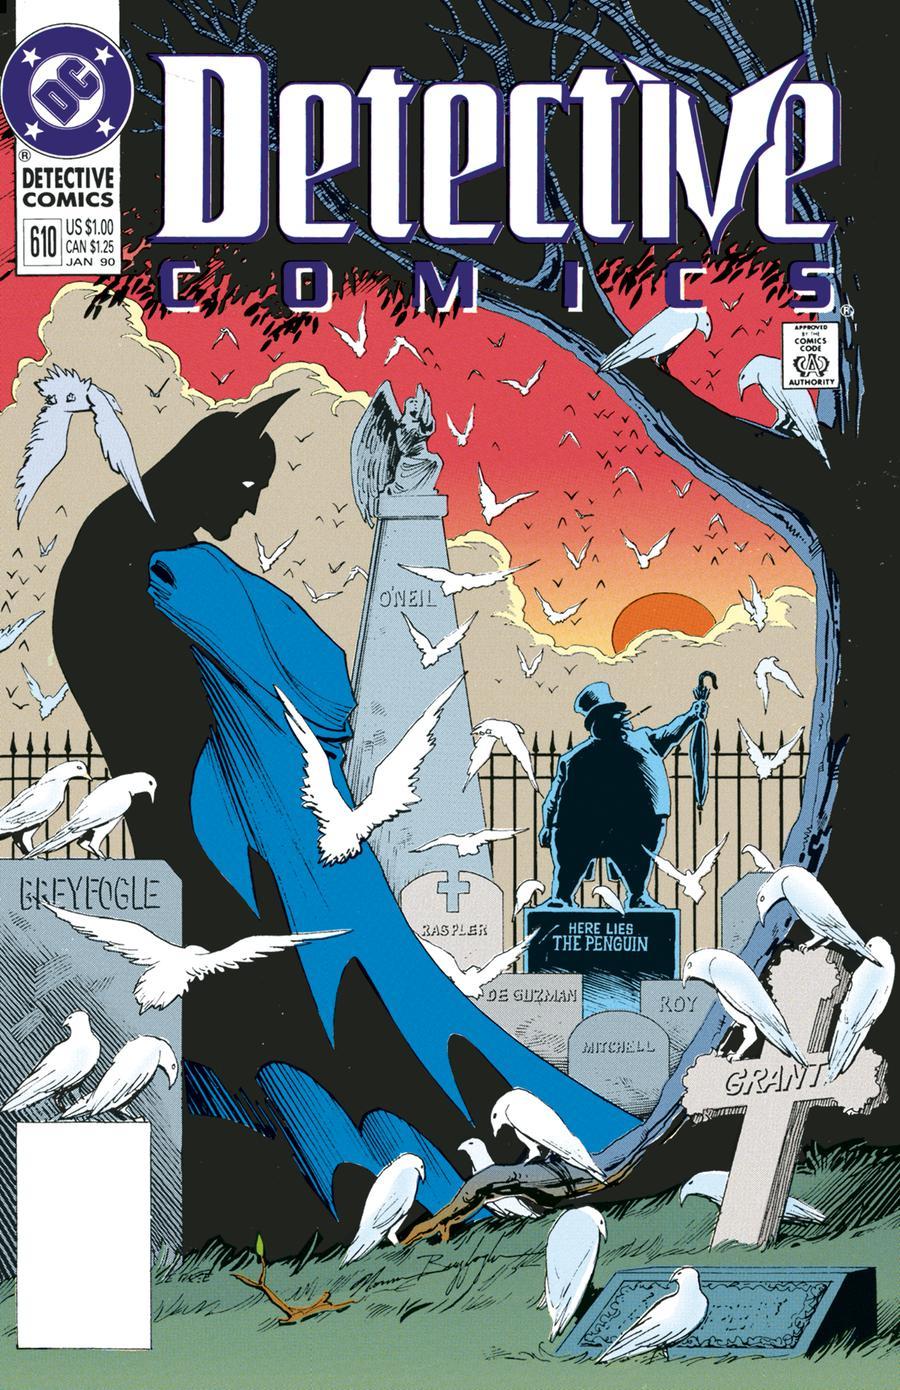 Legends Of The Dark Knight Norm Breyfogle Vol 2 HC